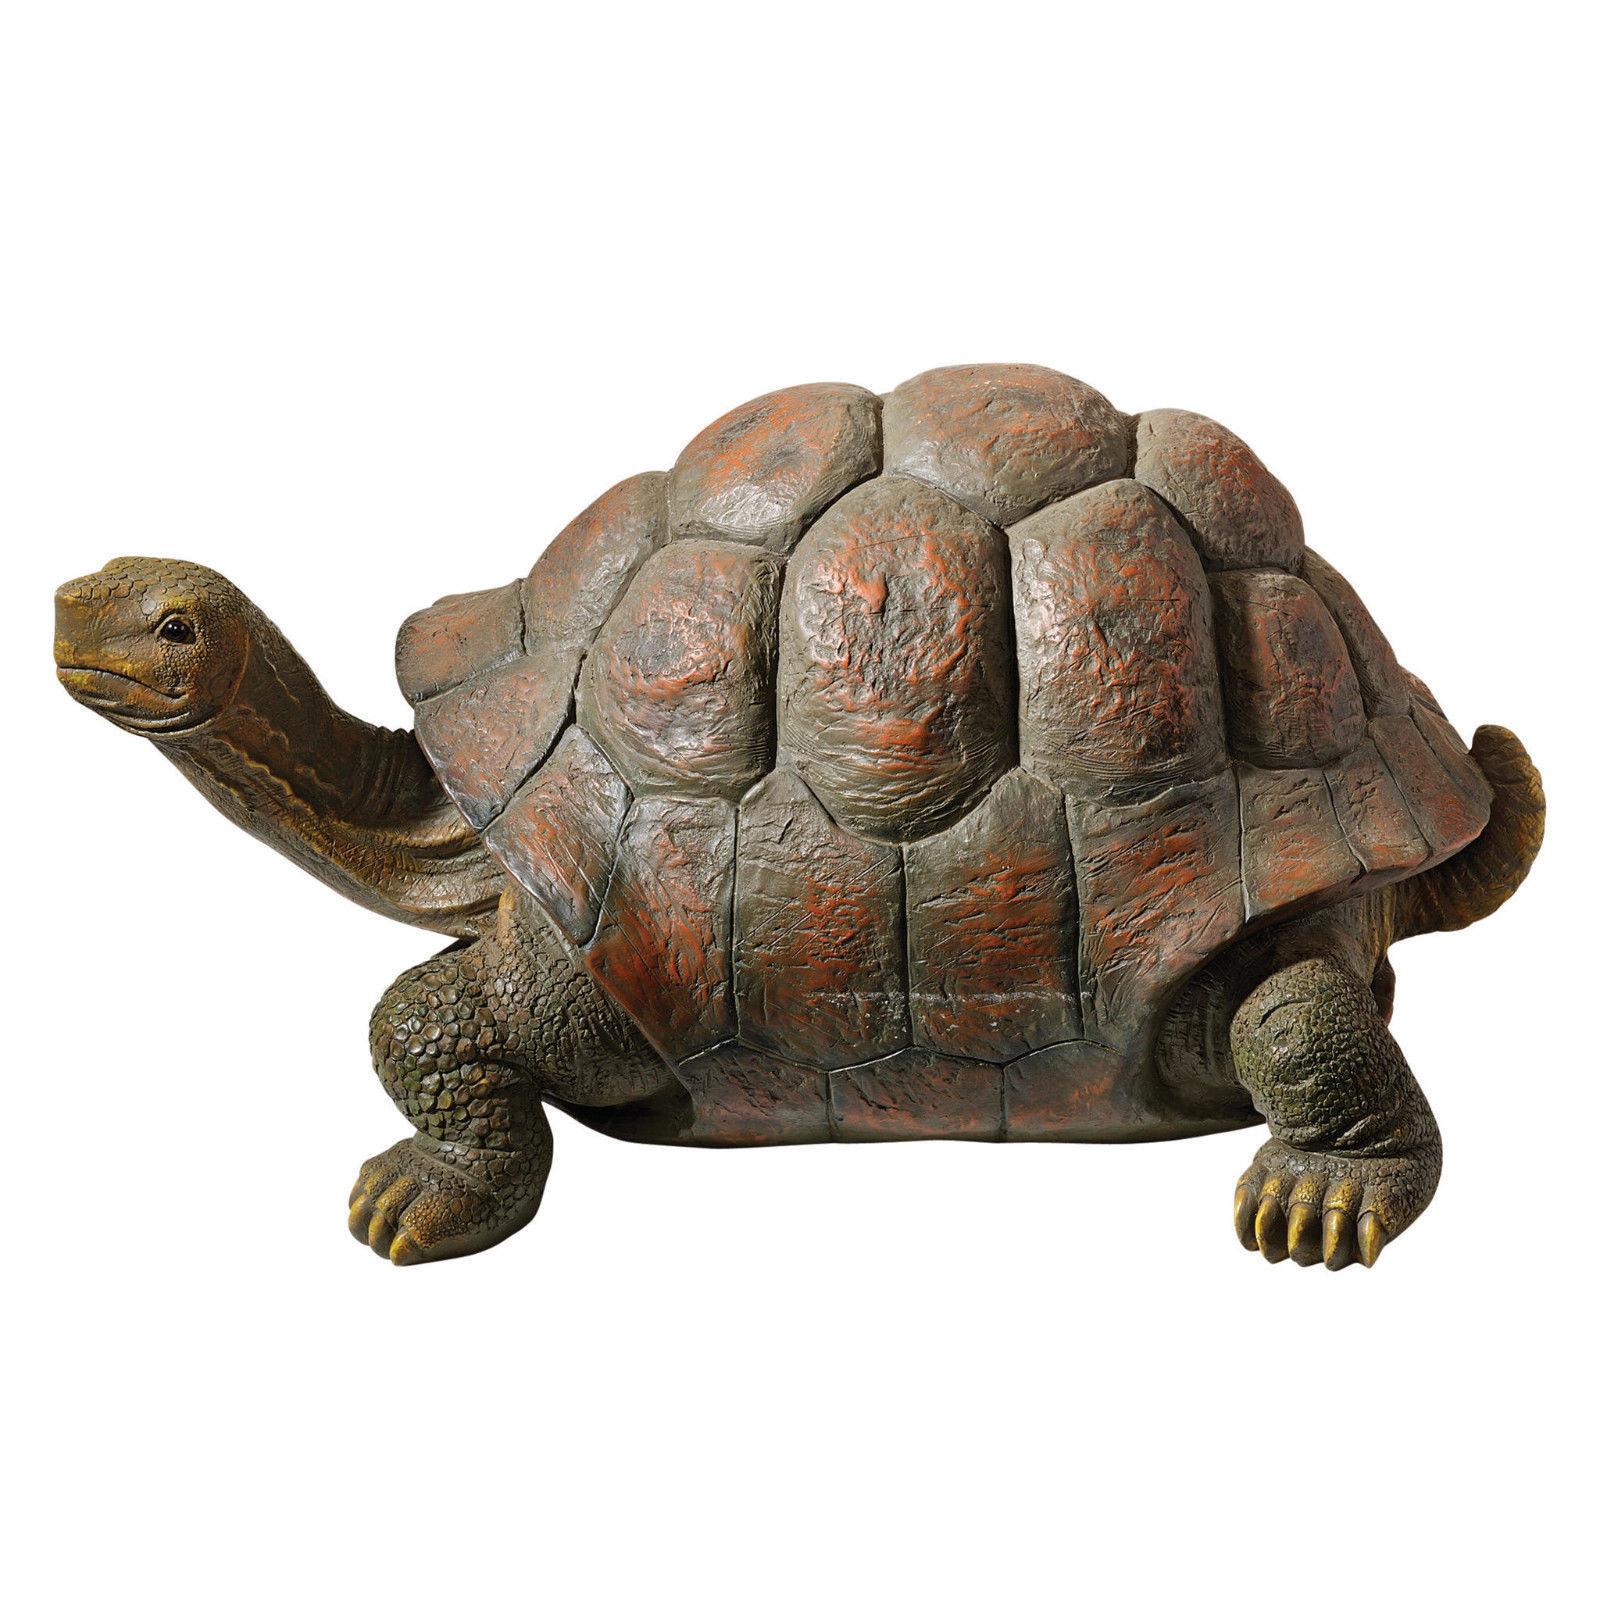 Garden pond turtle tortoise statue statuary lawn yard for Garden pond ornaments uk